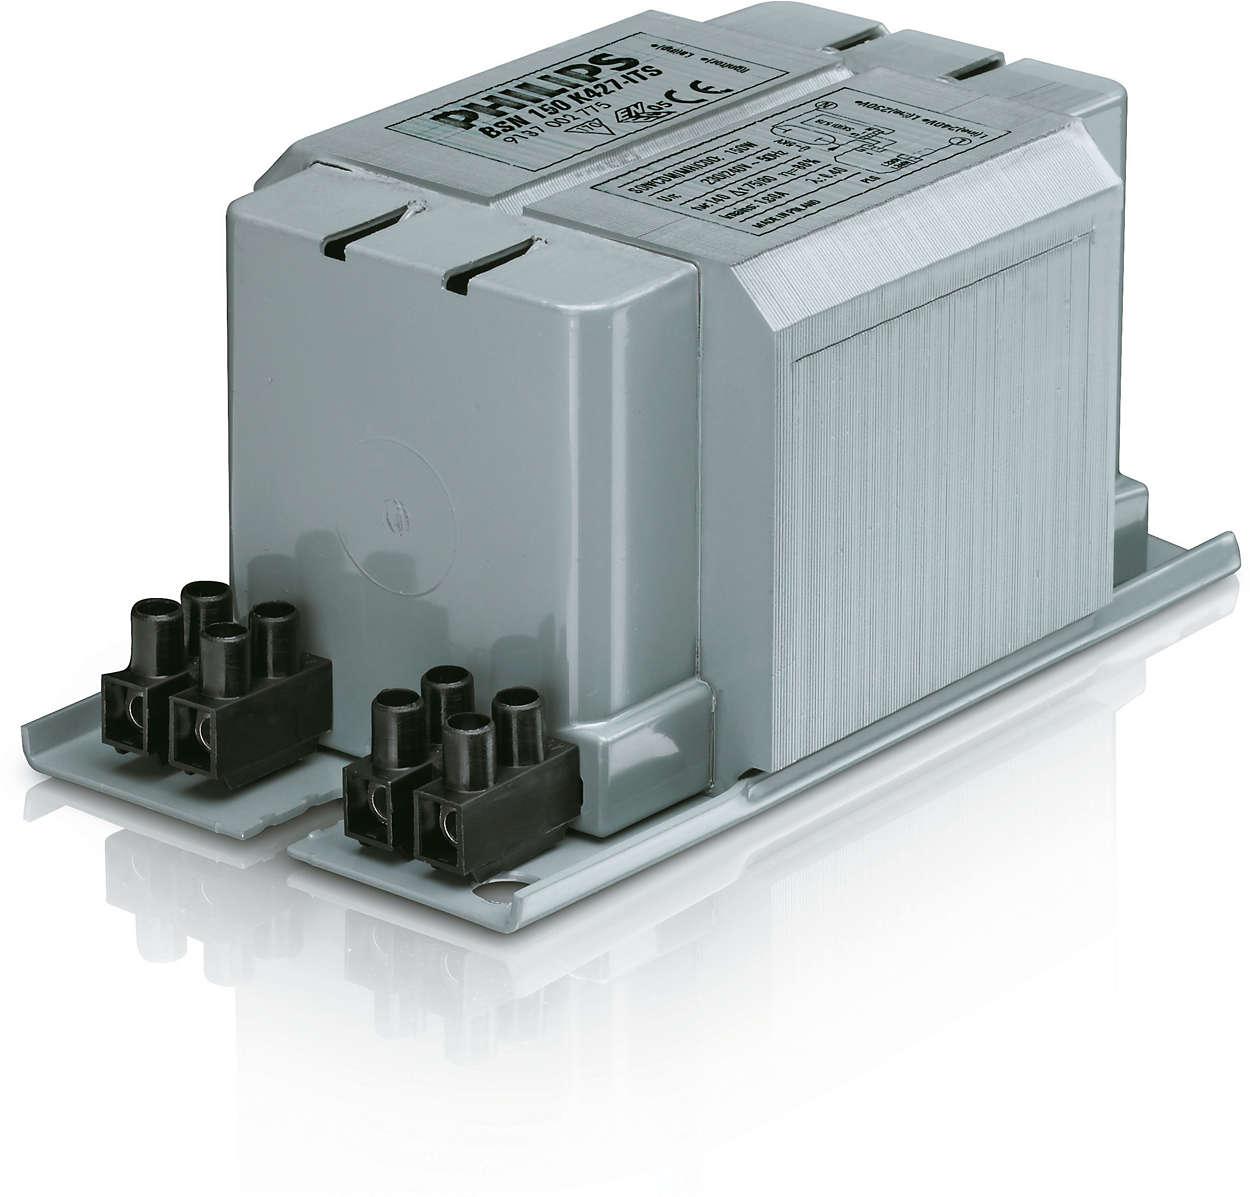 HID-Basic BSN/BMH MK4 полупараллельный для ламп SON/CDO/CDM/MH/HPI